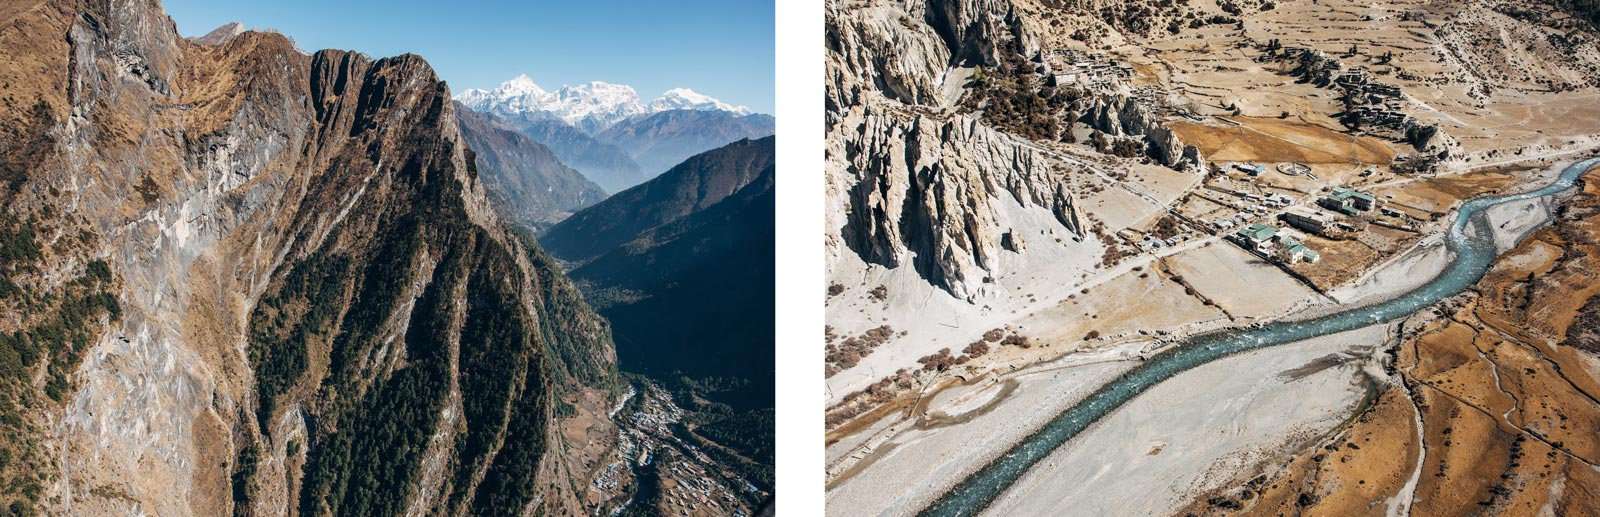 helicopter rapatriement népal